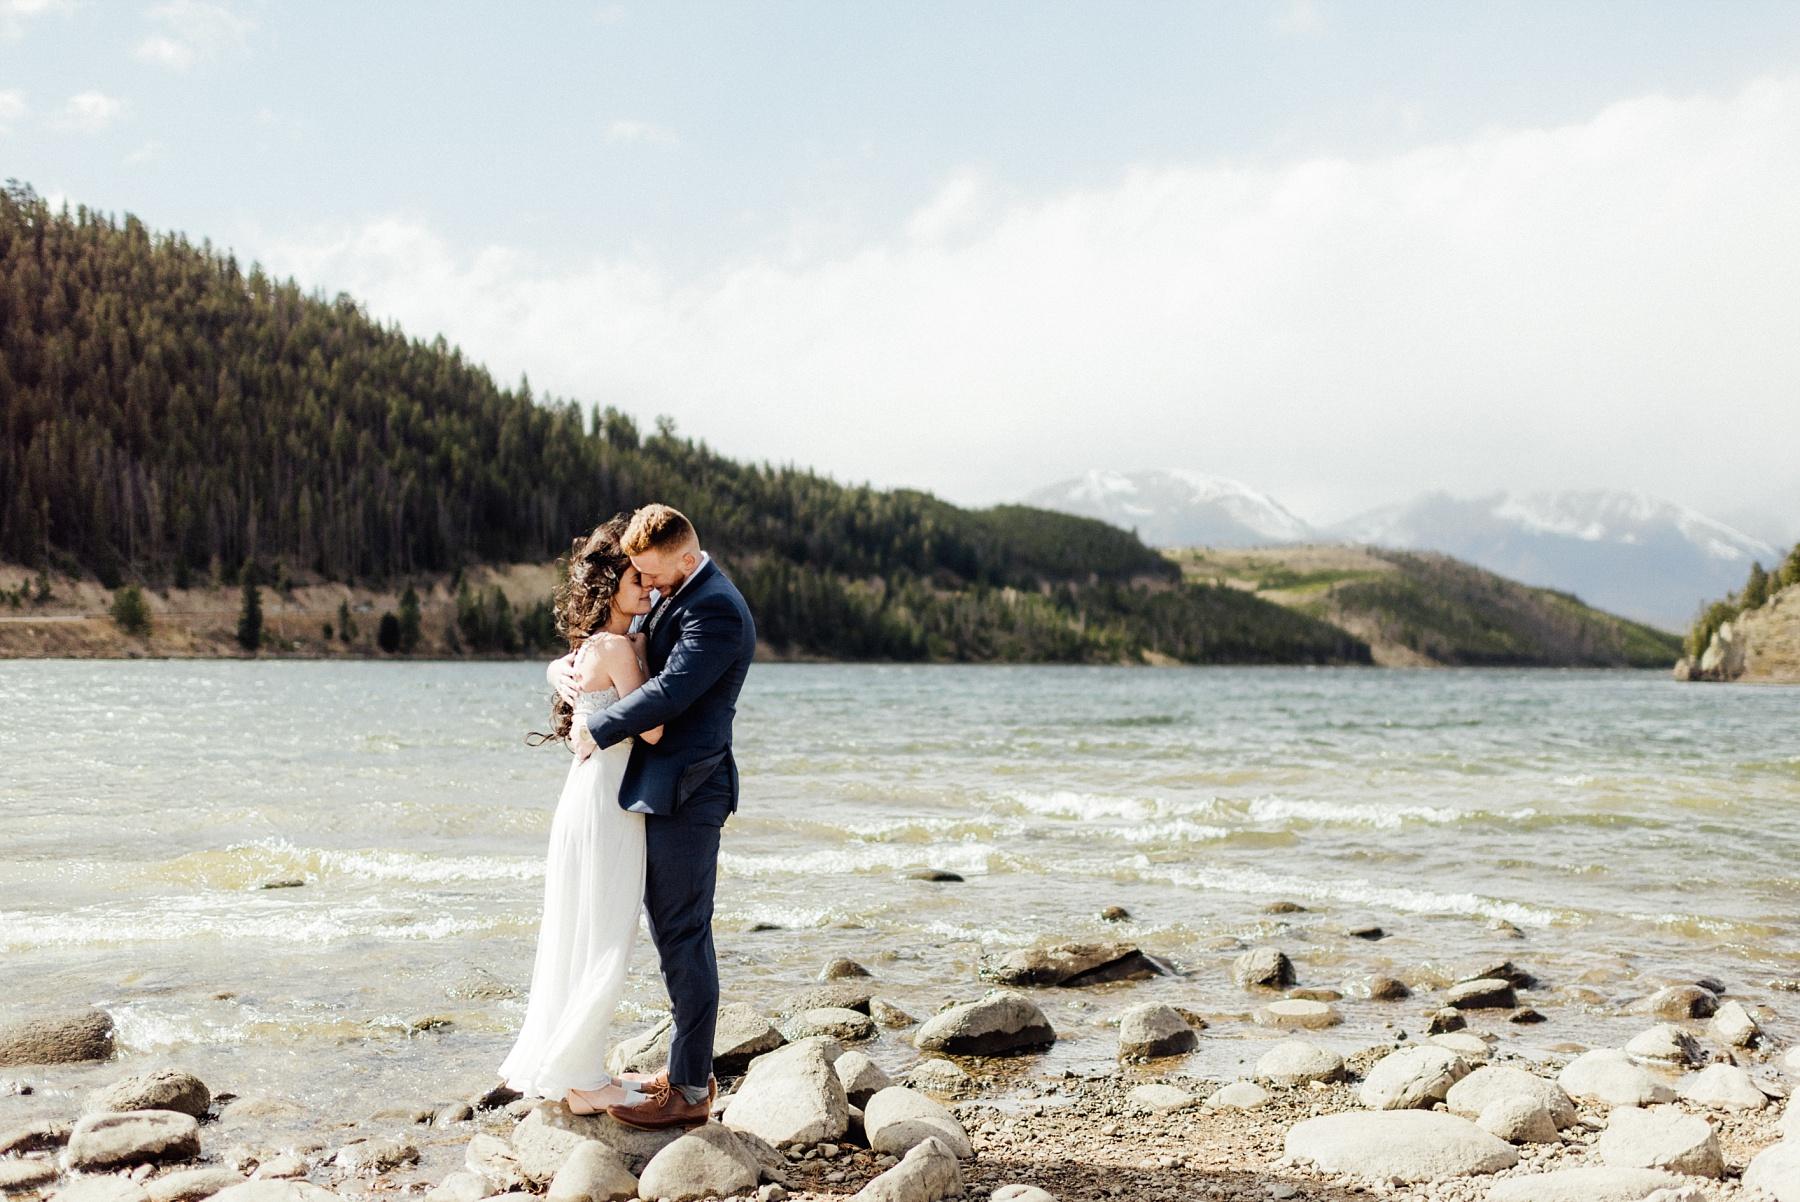 elopement at lake dillon in colorado